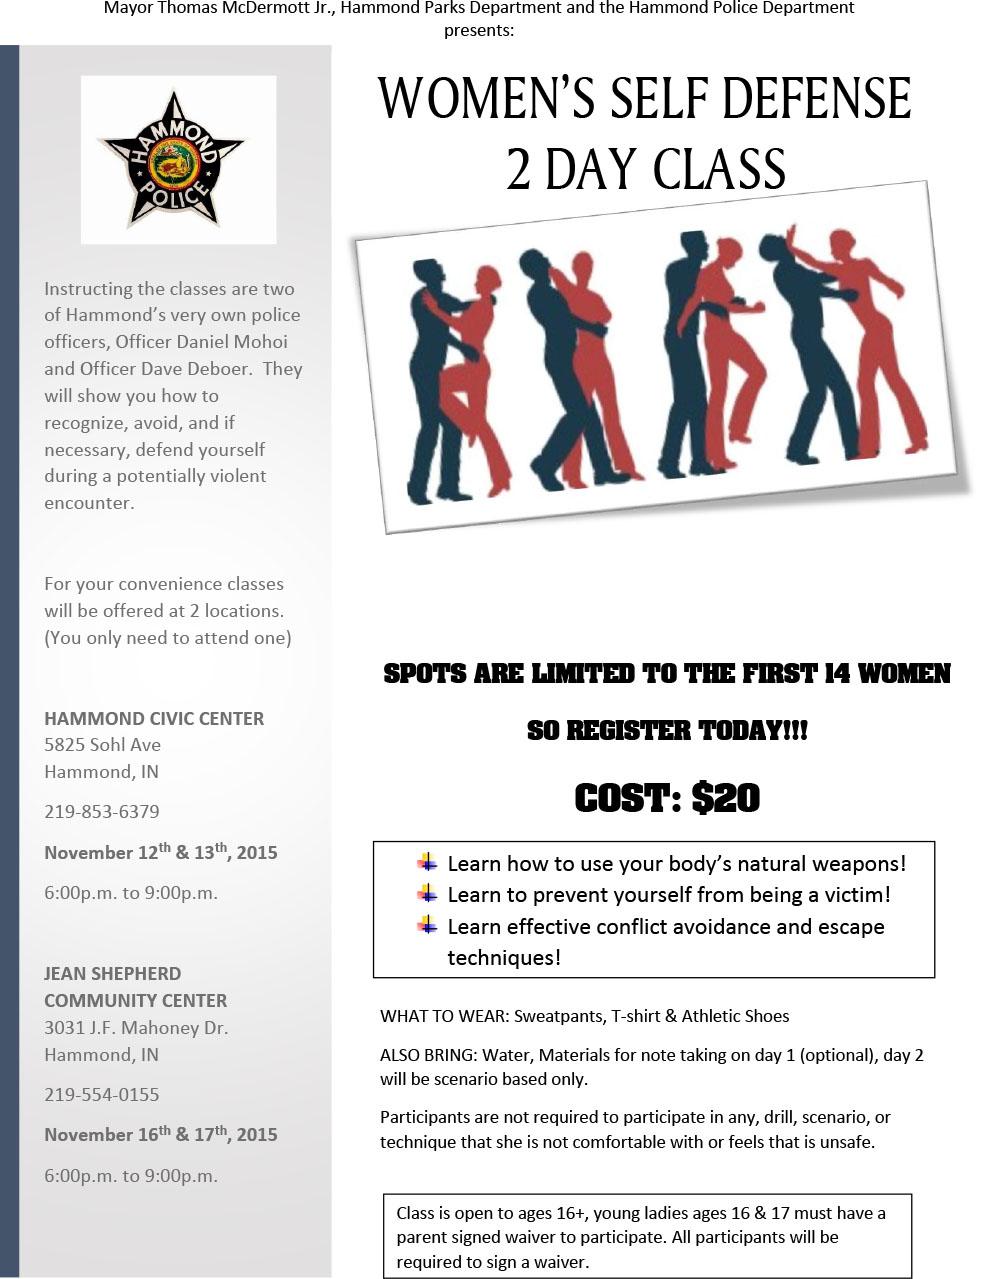 Women's 2 Day Self Defense Class